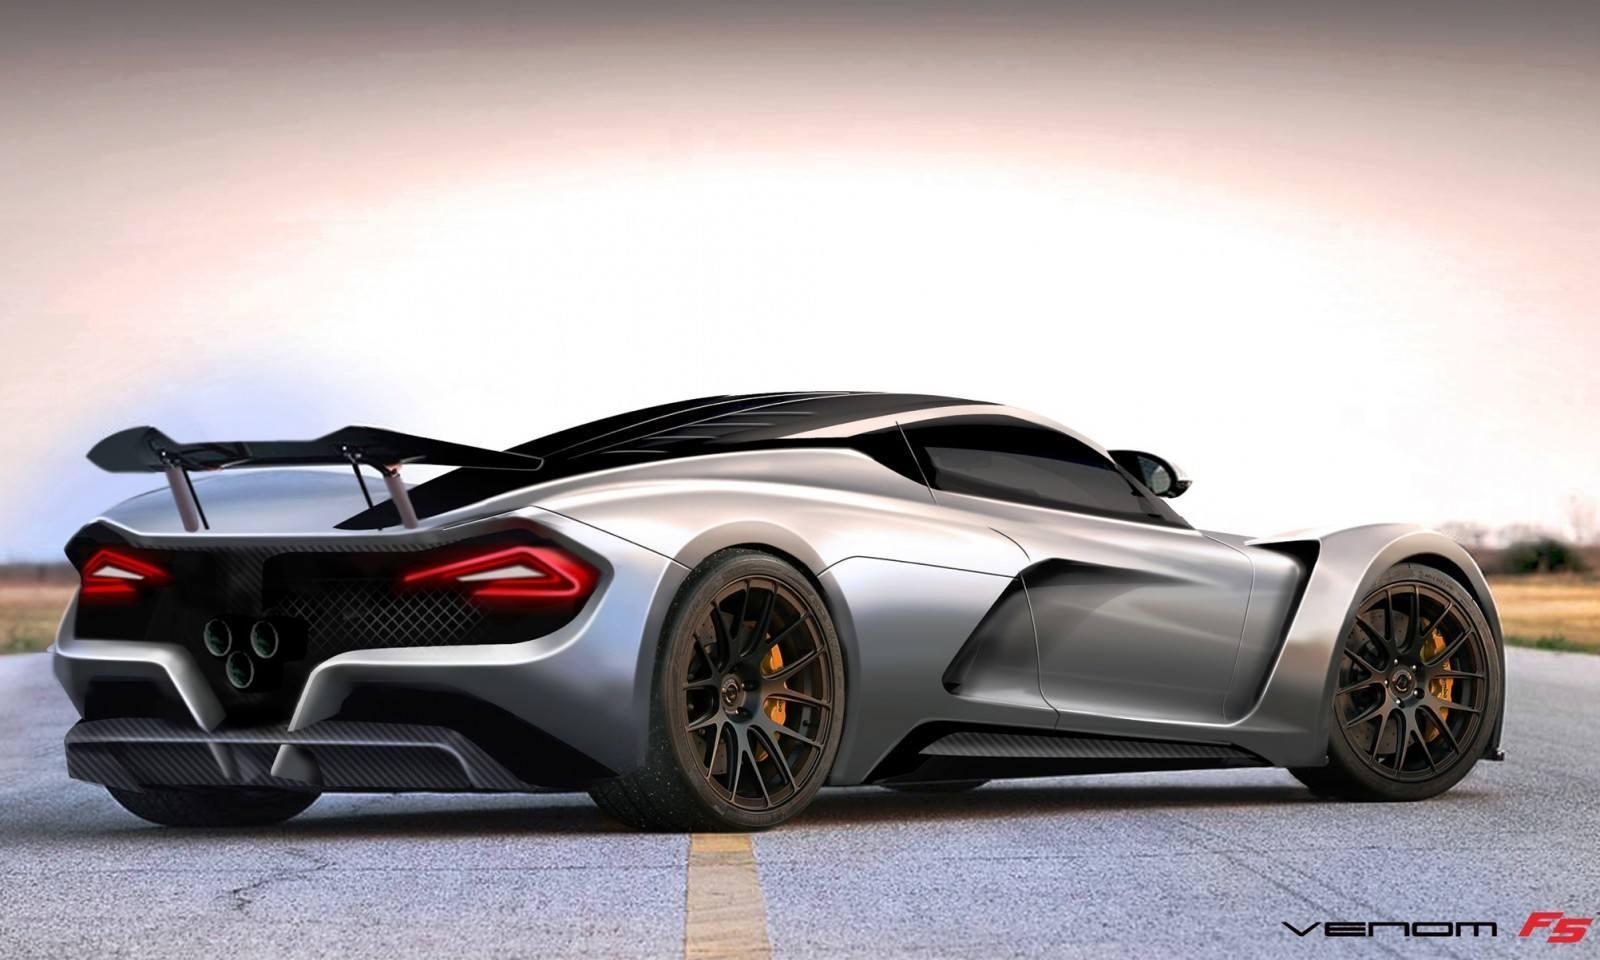 2015 Hennessey Venom F5 Seeks Real 290MPH VMax Via New V8TT, Active Aero and Low-Drag Design 10